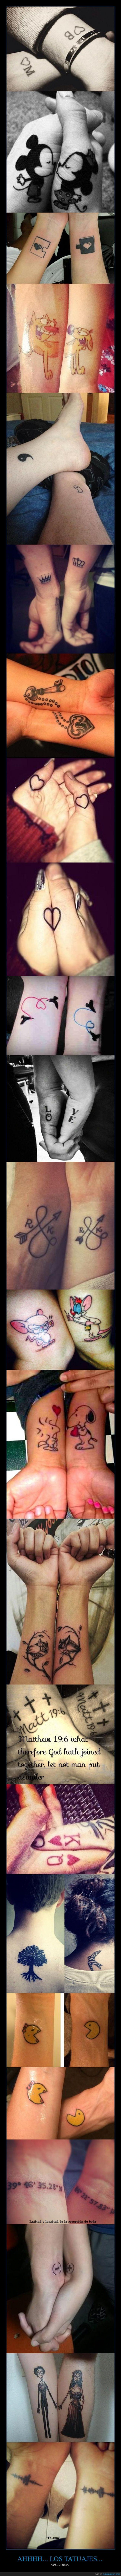 amor,chica,chico,moñada,novia,novio,pareja,tattoo,tatuaje,tomantico